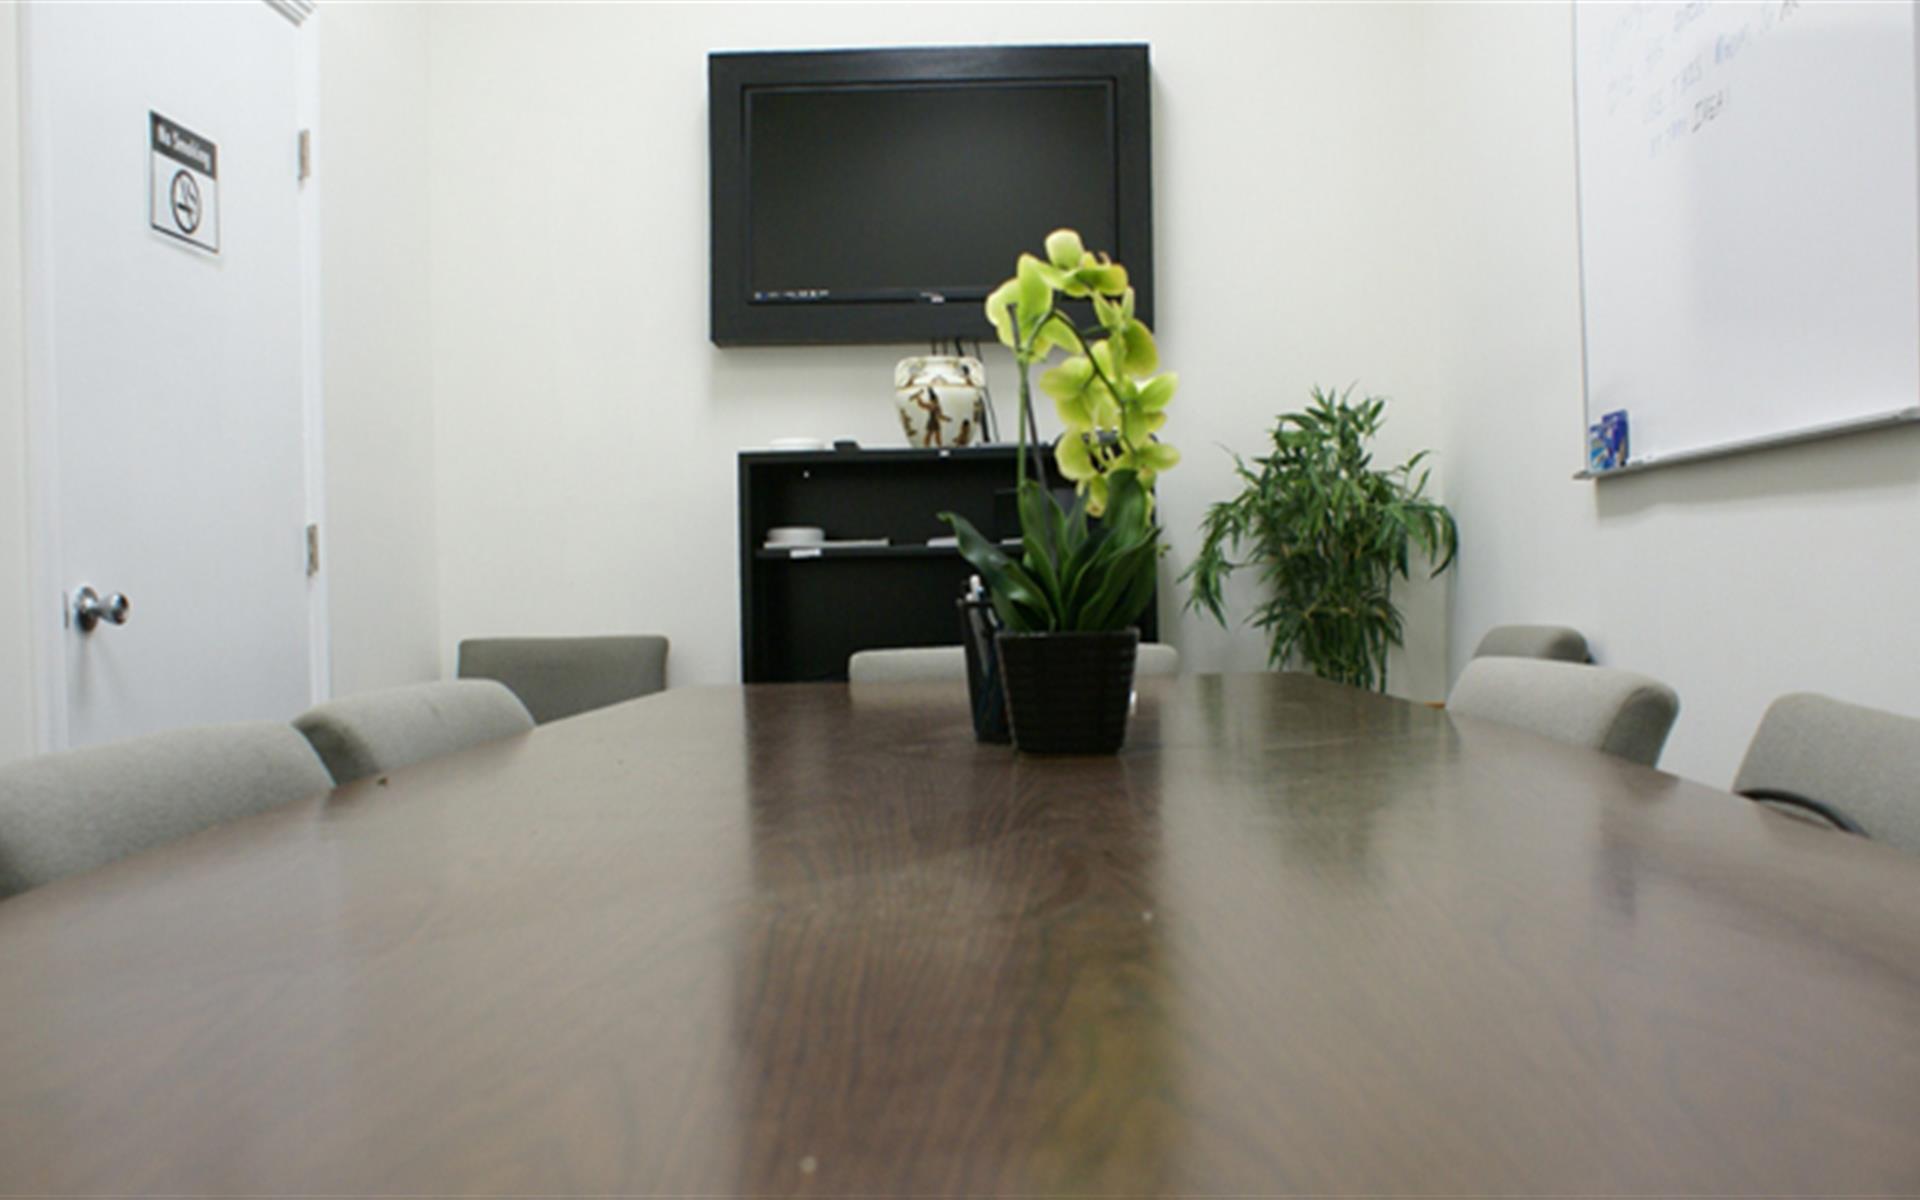 officeLOCALE Coworking Space & Cyberscraper - Private Office/Meeting Room WEEKENDS